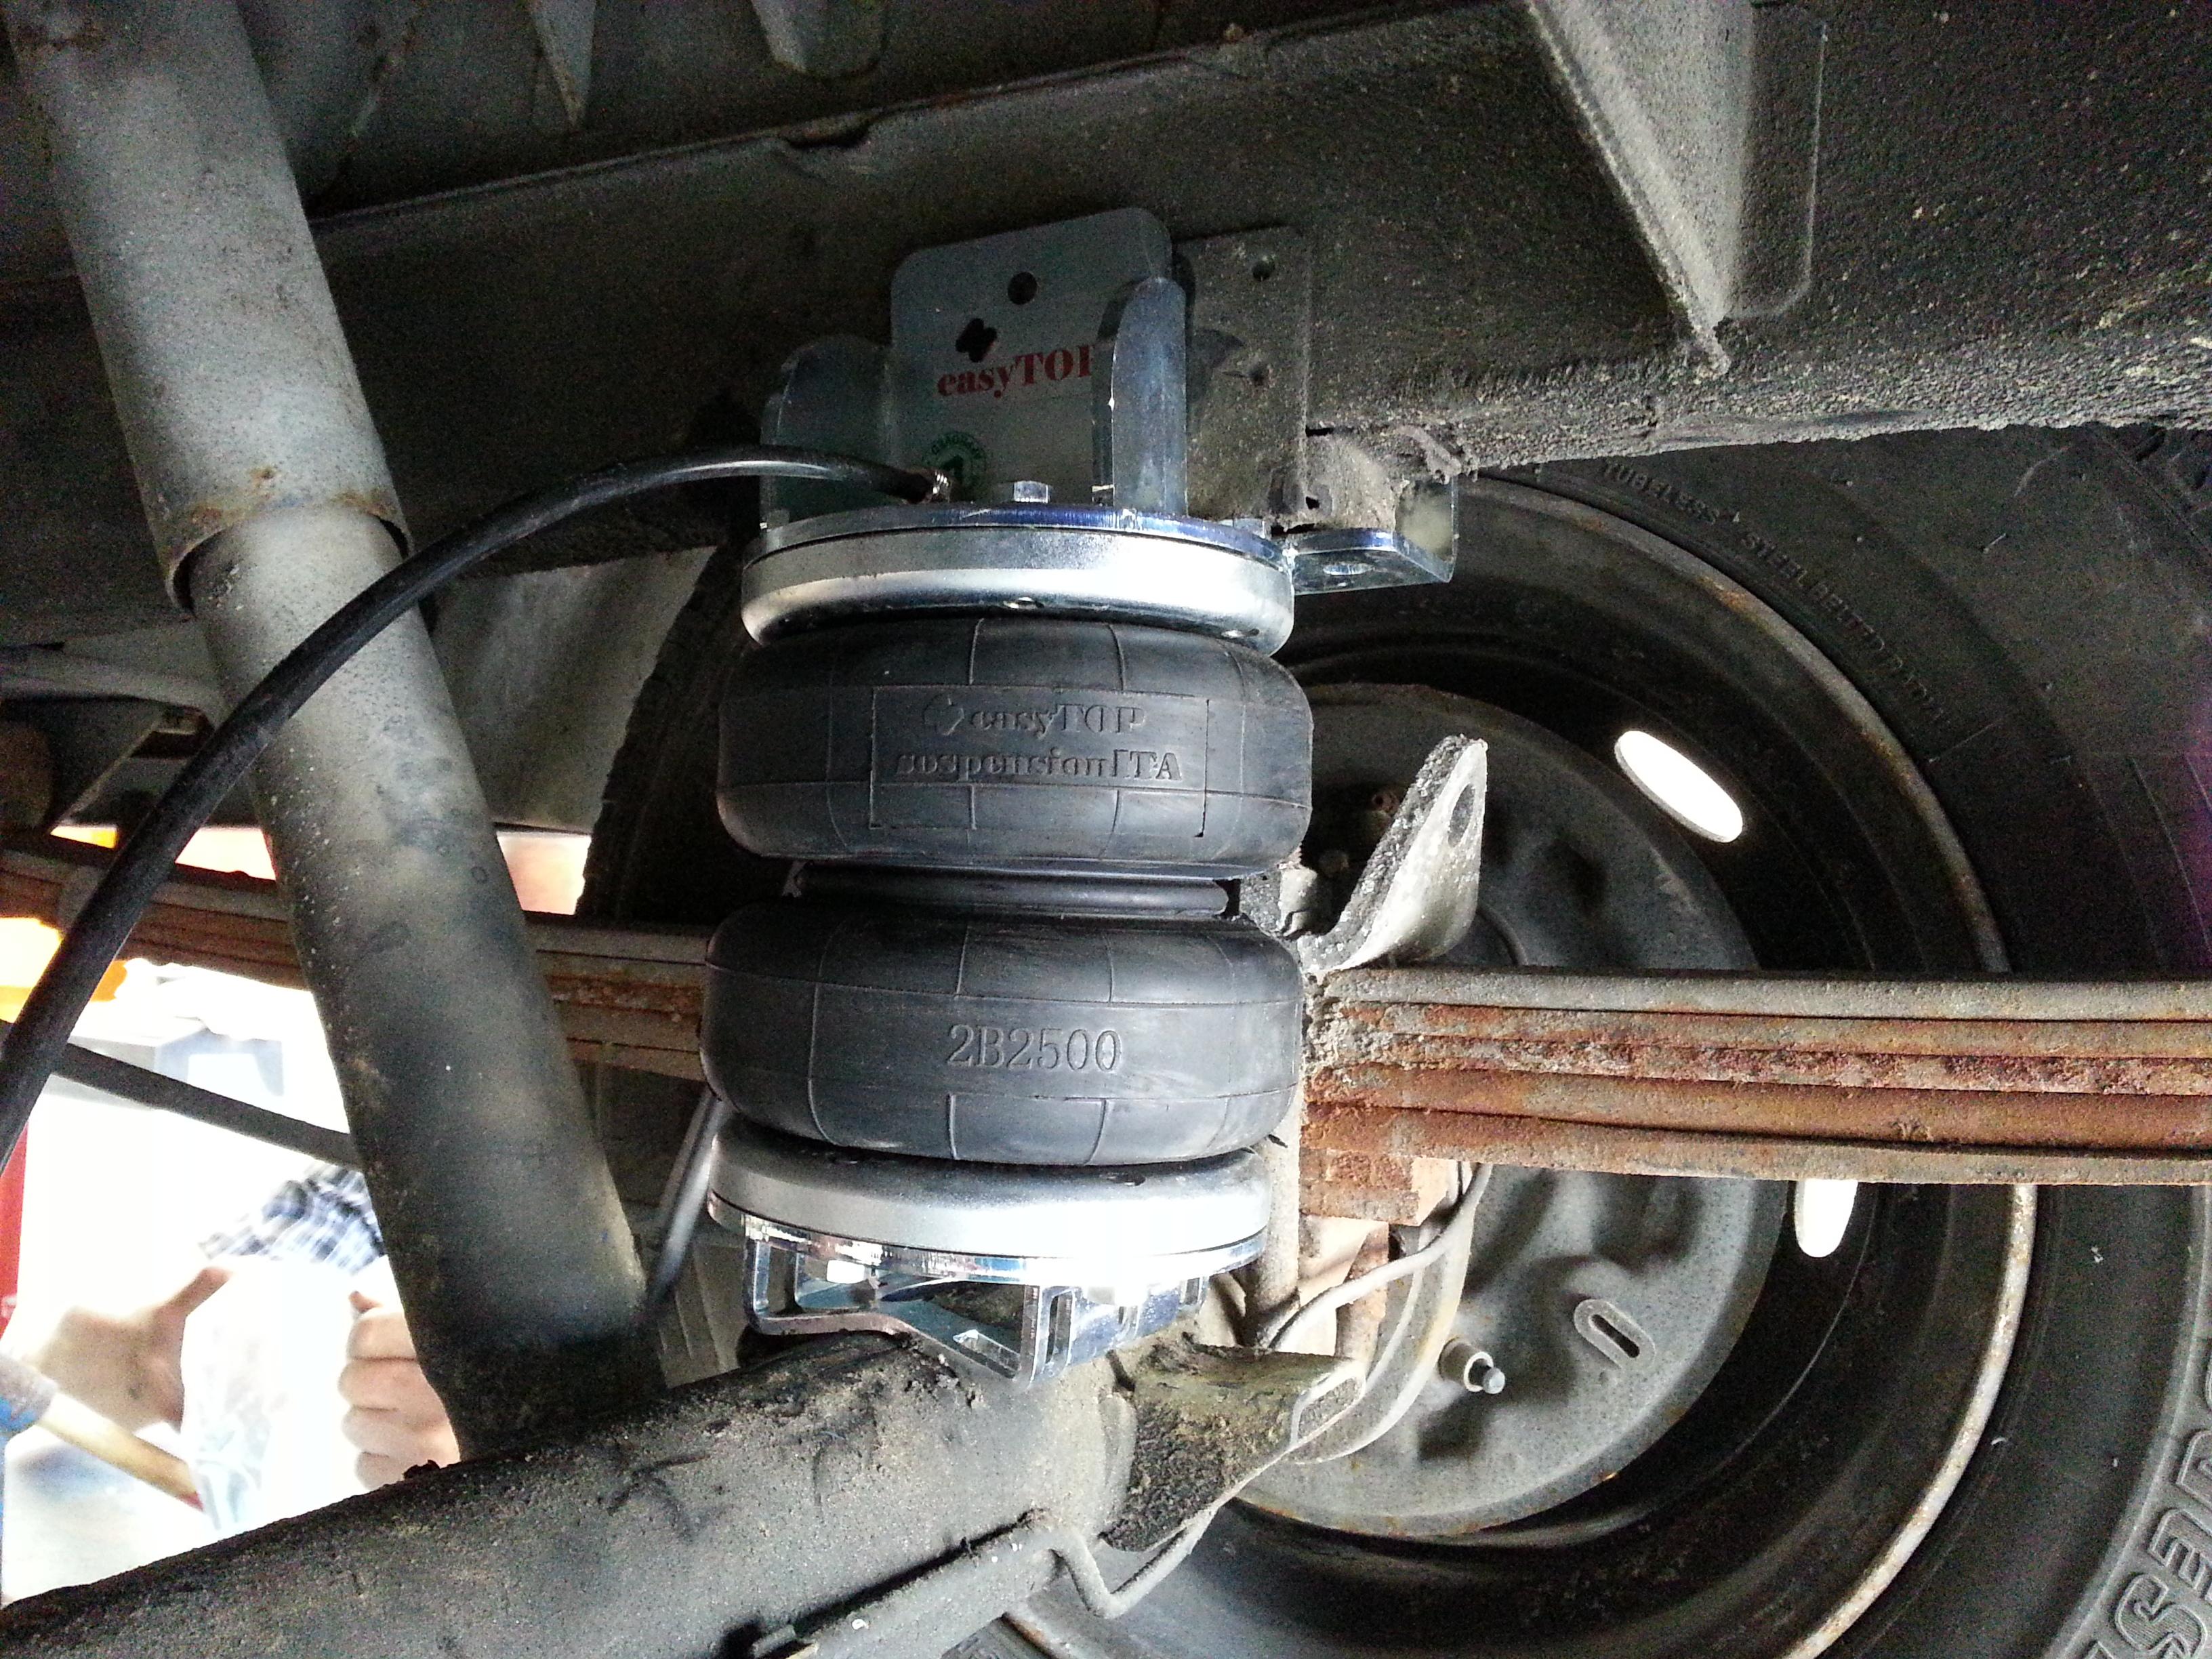 Sospensioni molle soffioni ad aria easytop camper furgone for Kit trasformazione furgone in camper